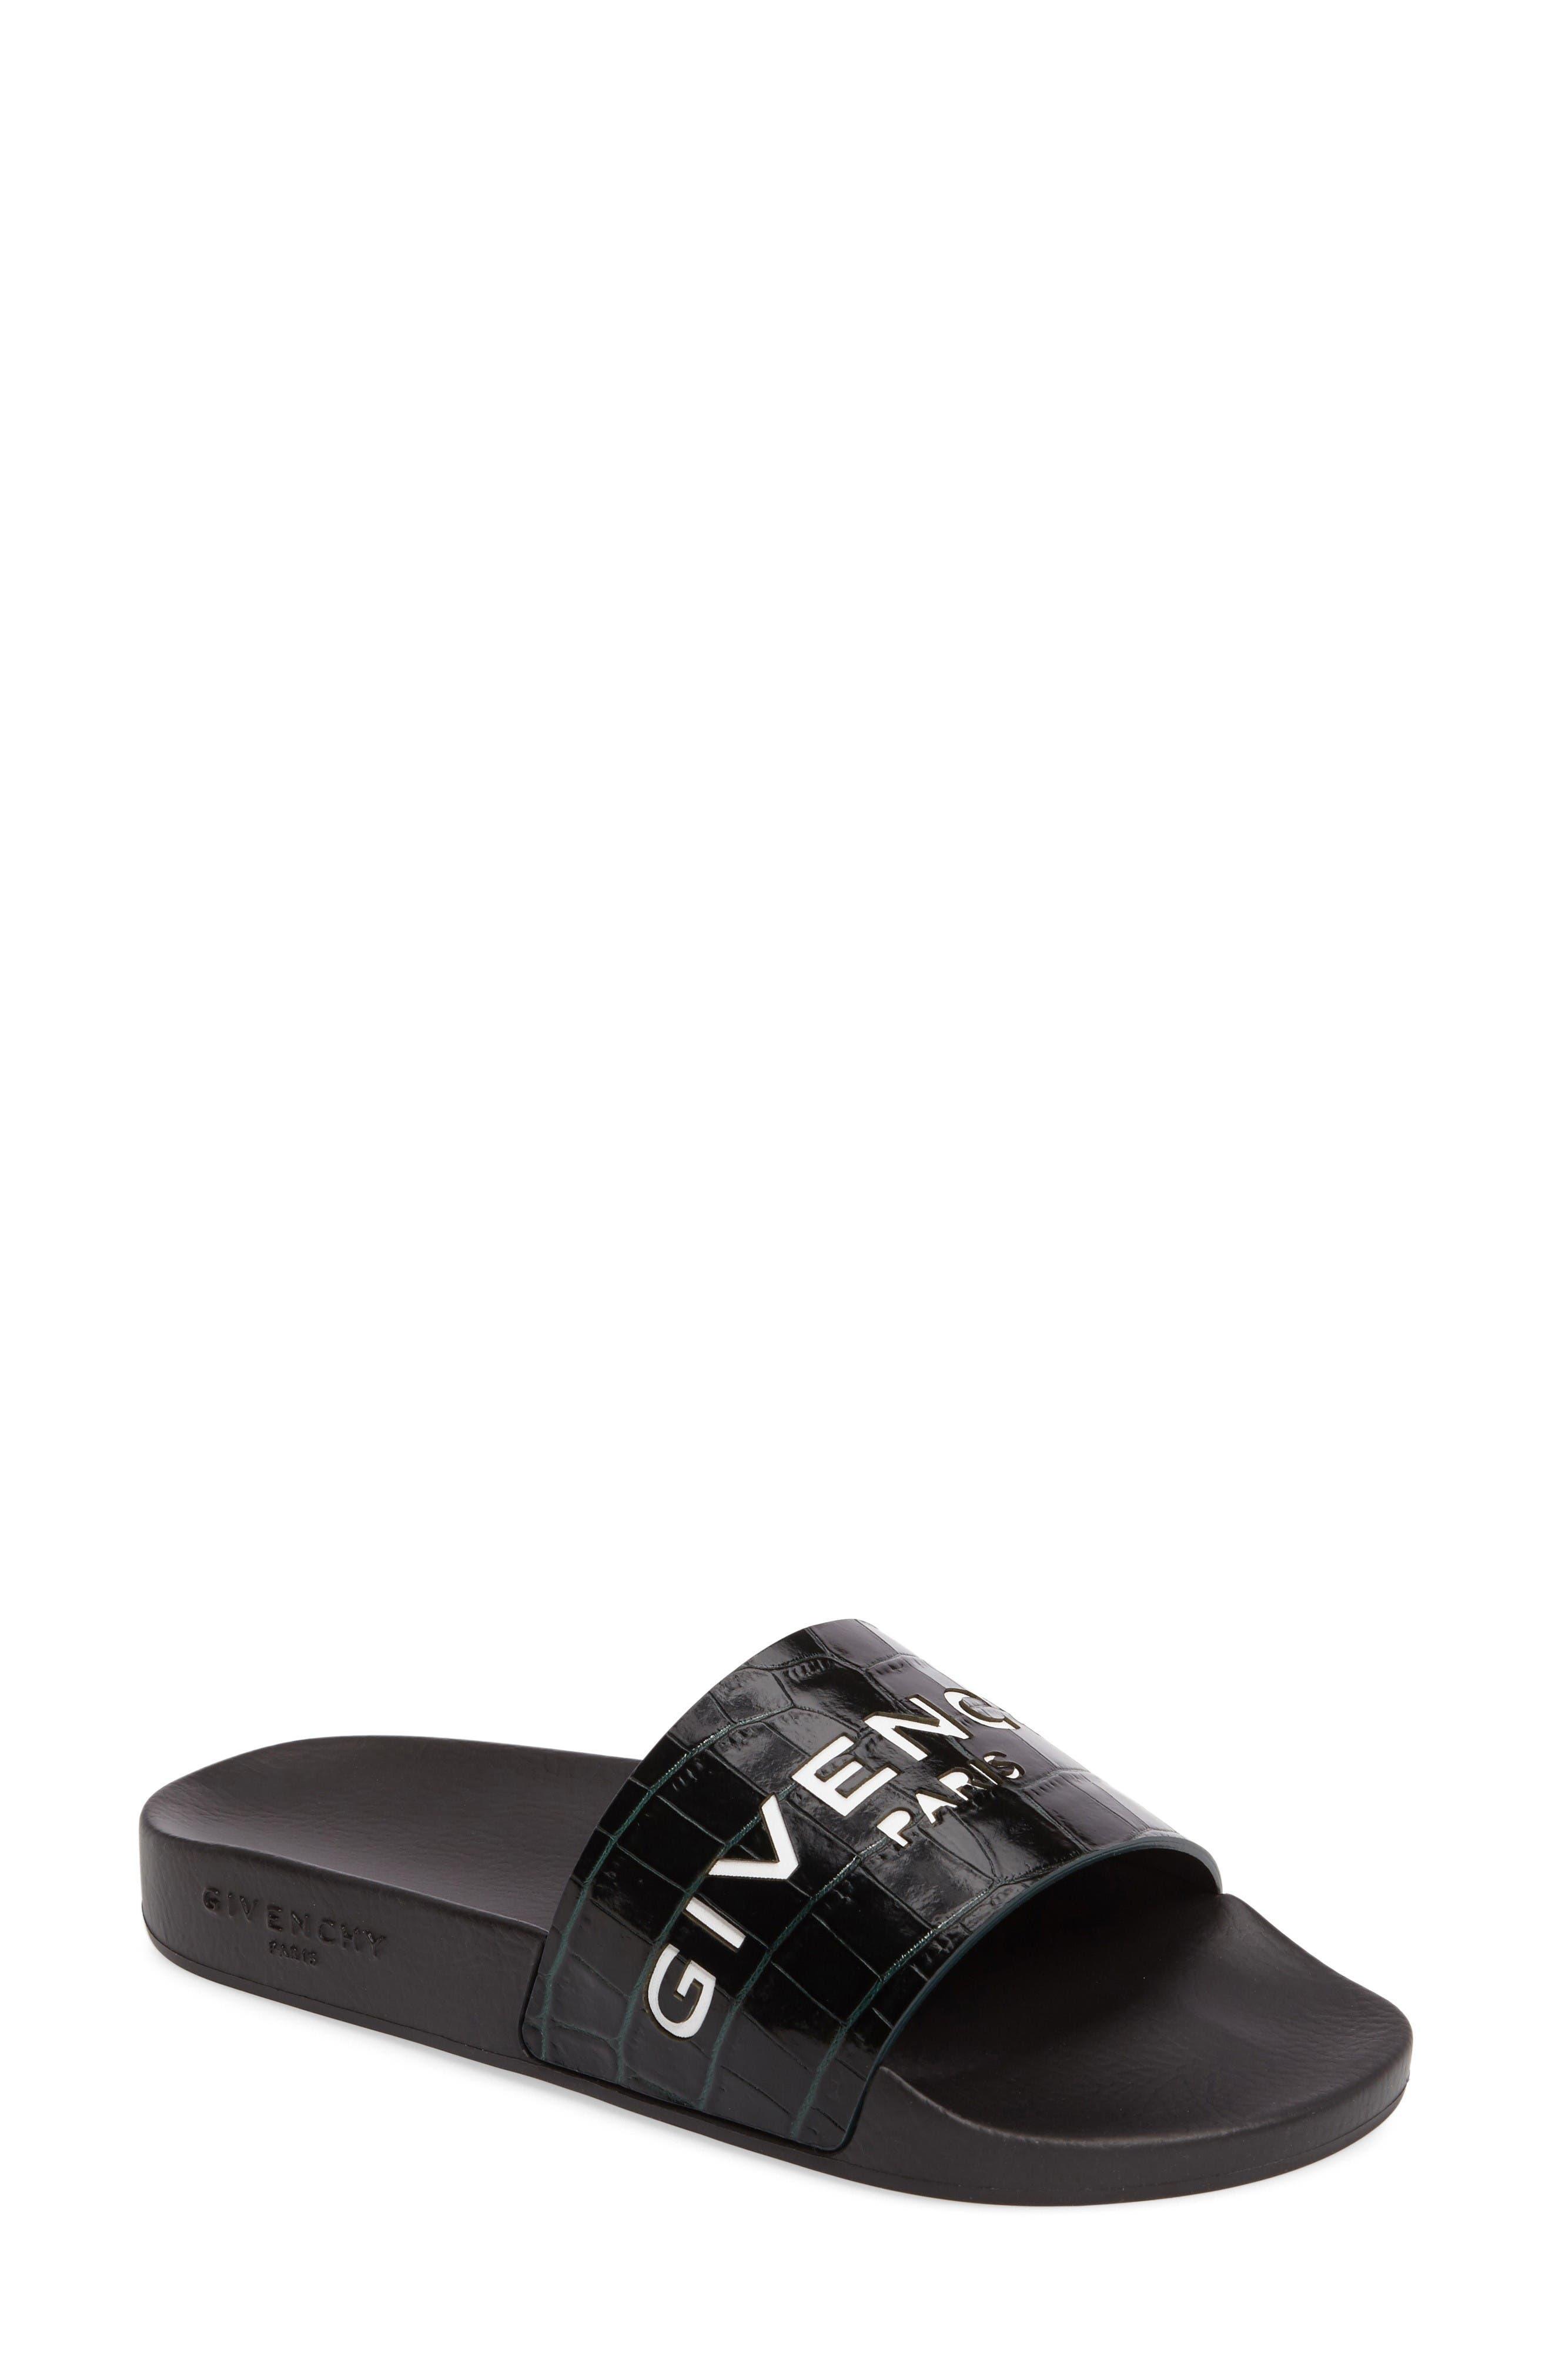 Alternate Image 1 Selected - Givenchy Logo Slide Sandal (Women)